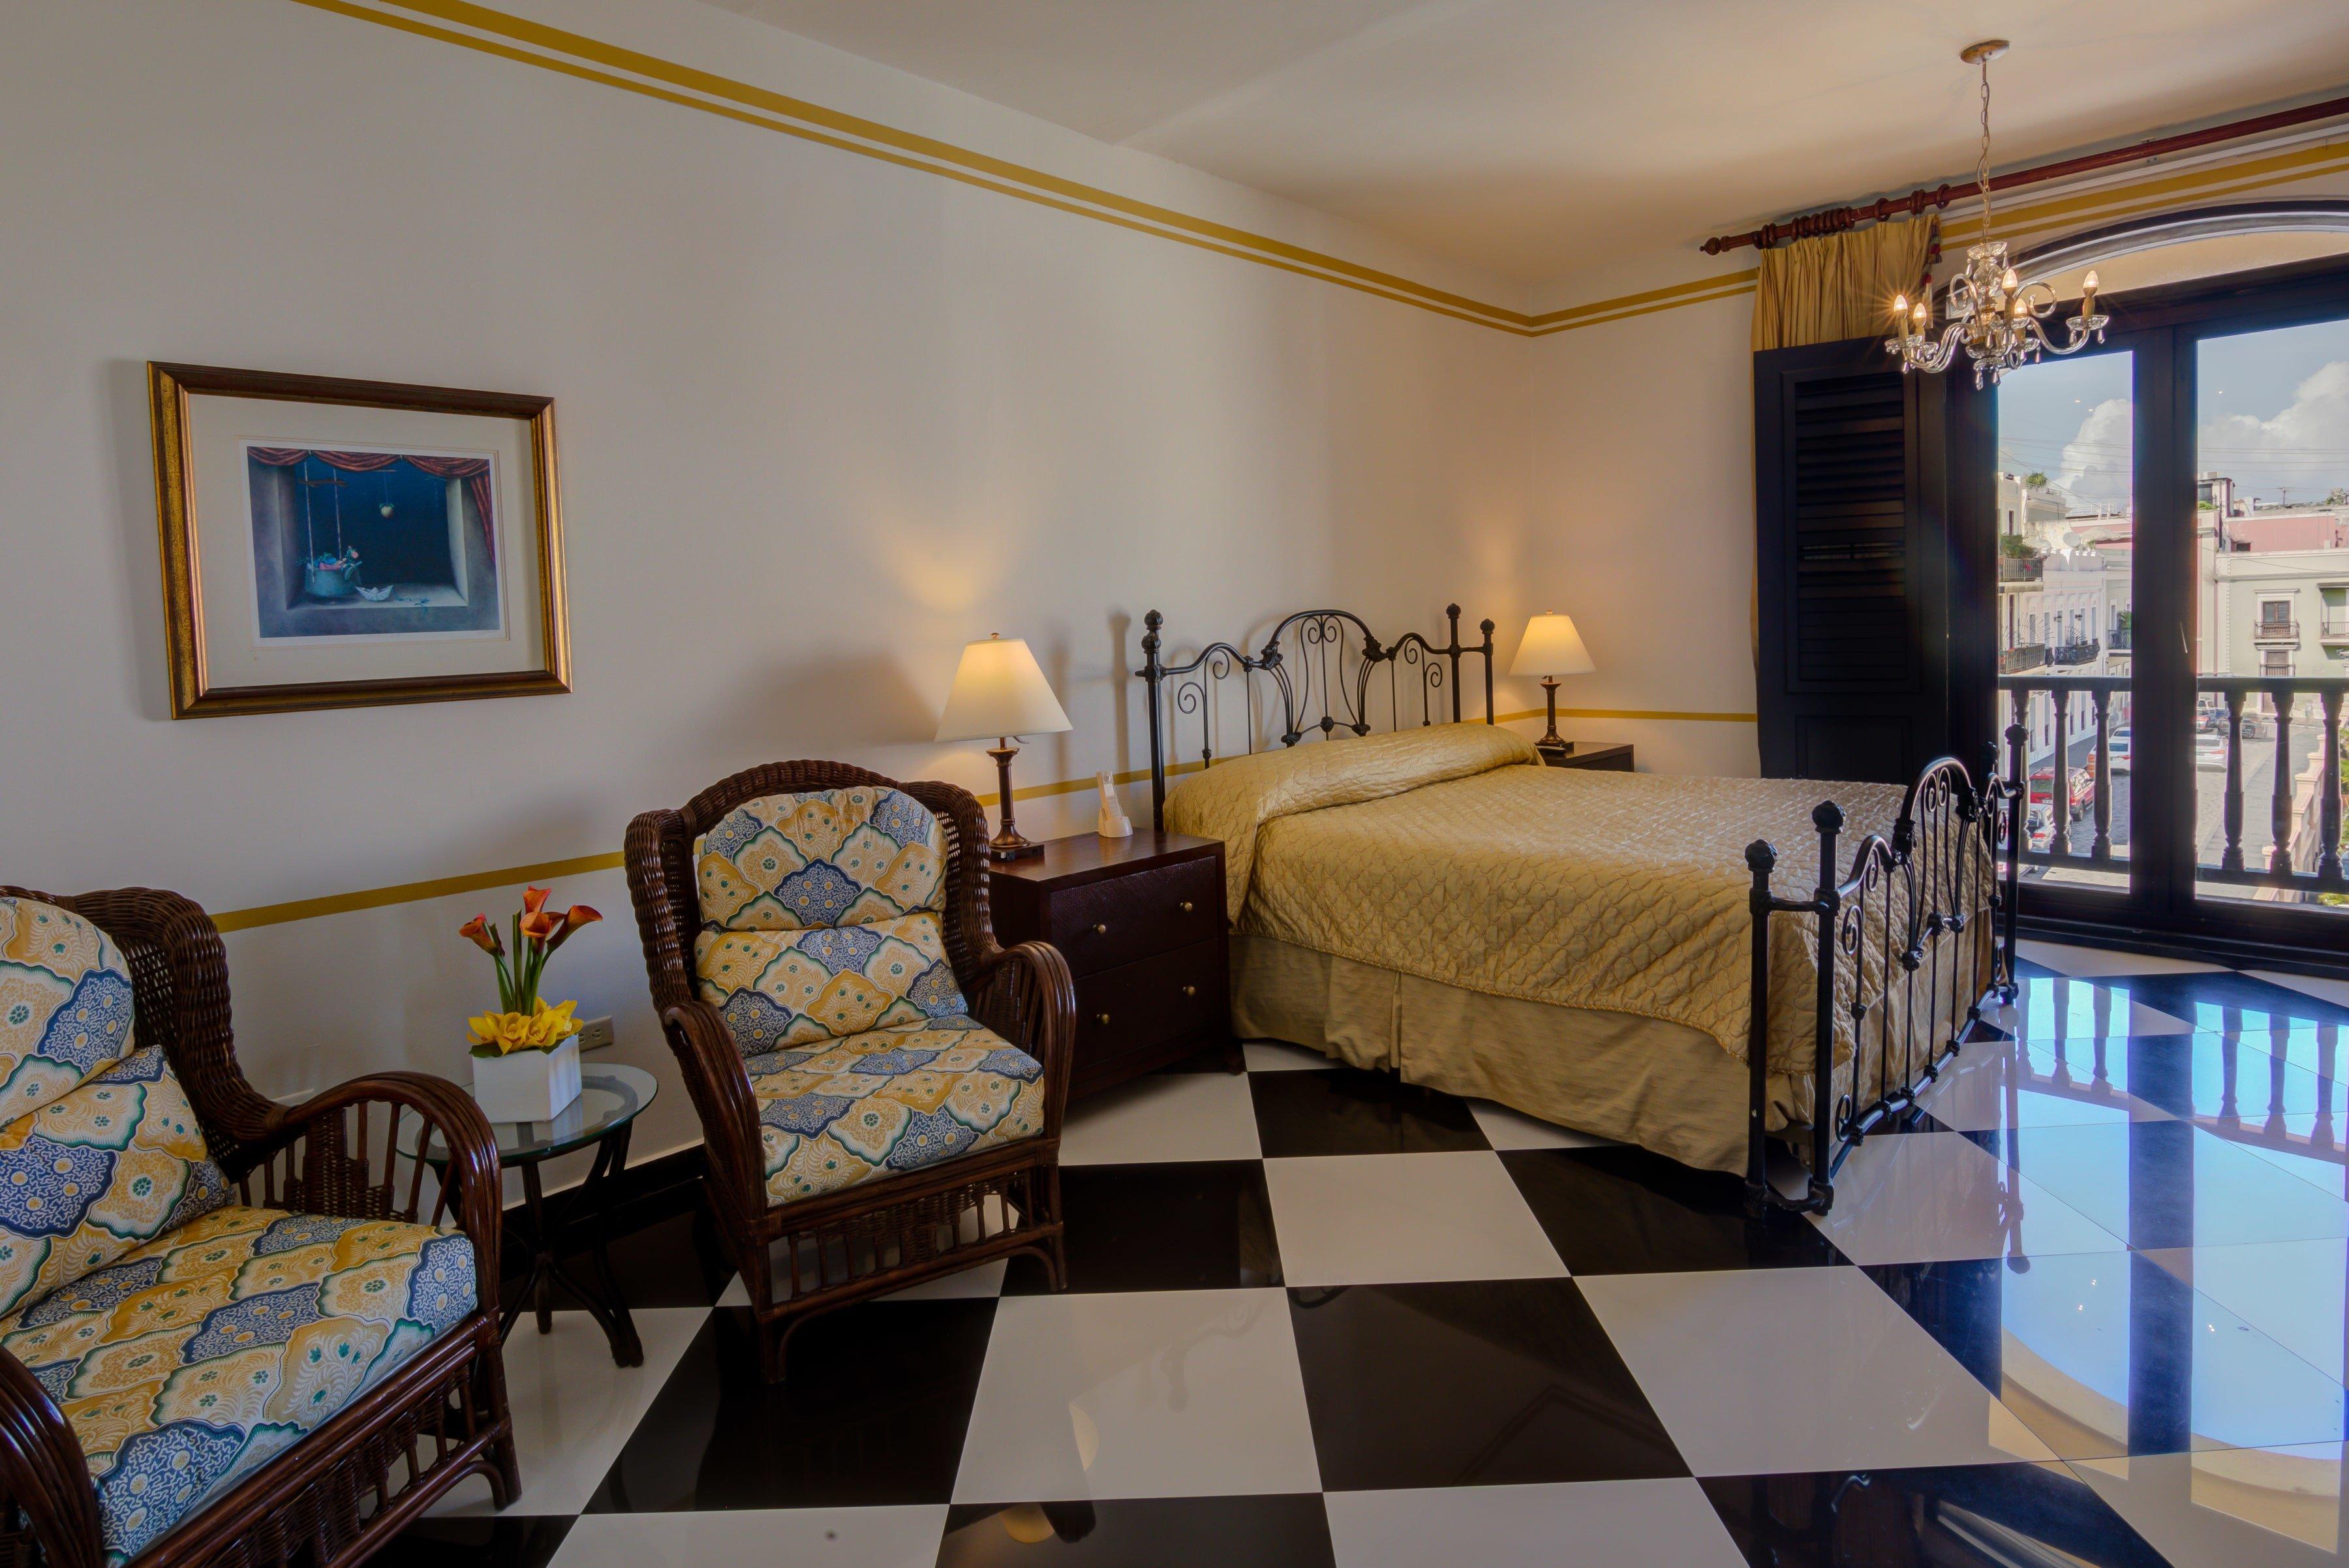 Pablo Casals Suite Bedroom